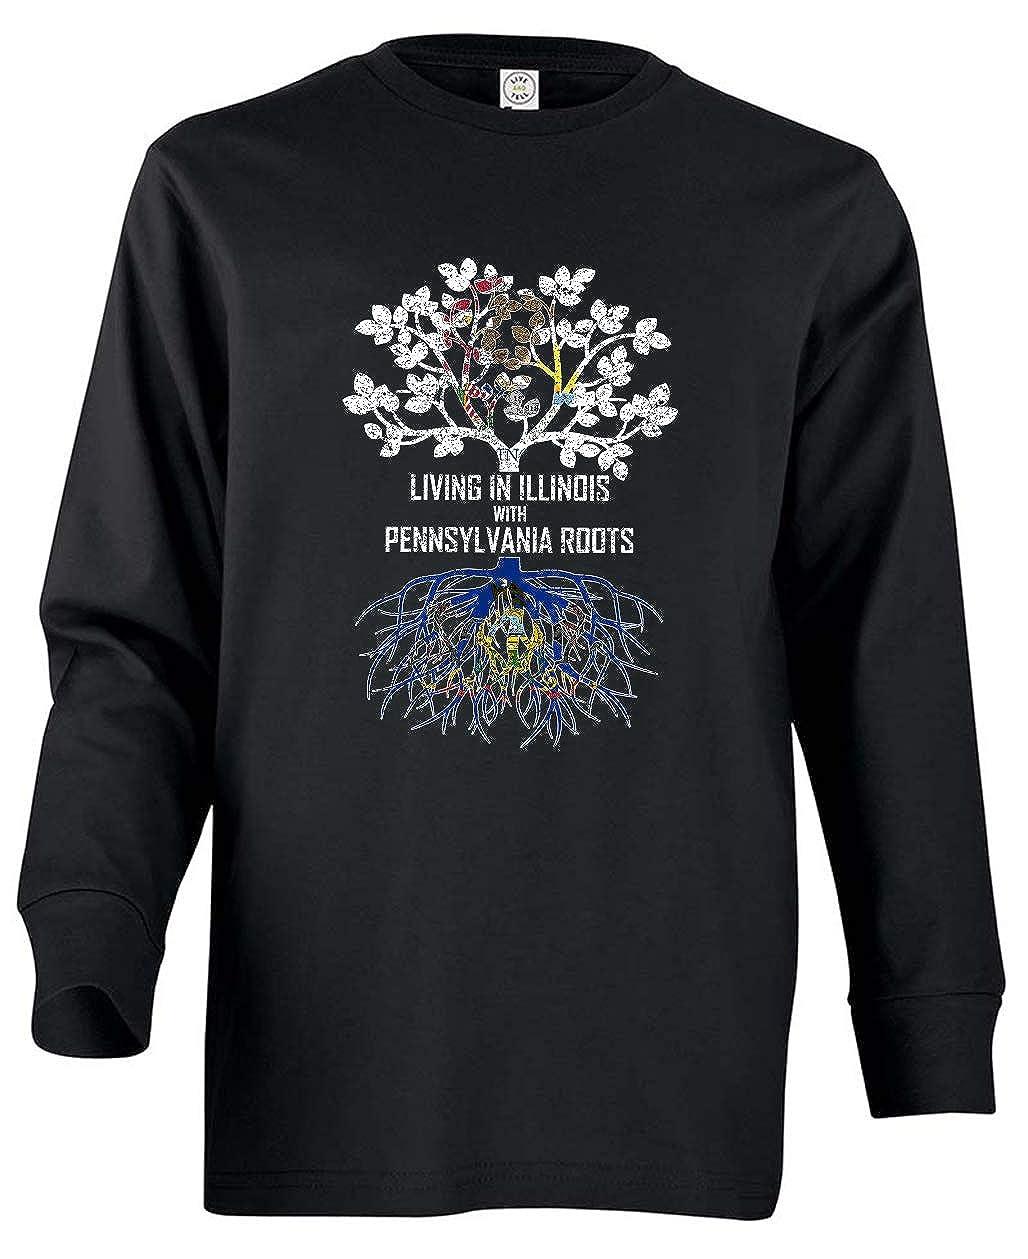 Tenacitee Babys Living in Illinois Pennsylvania Roots Shirt